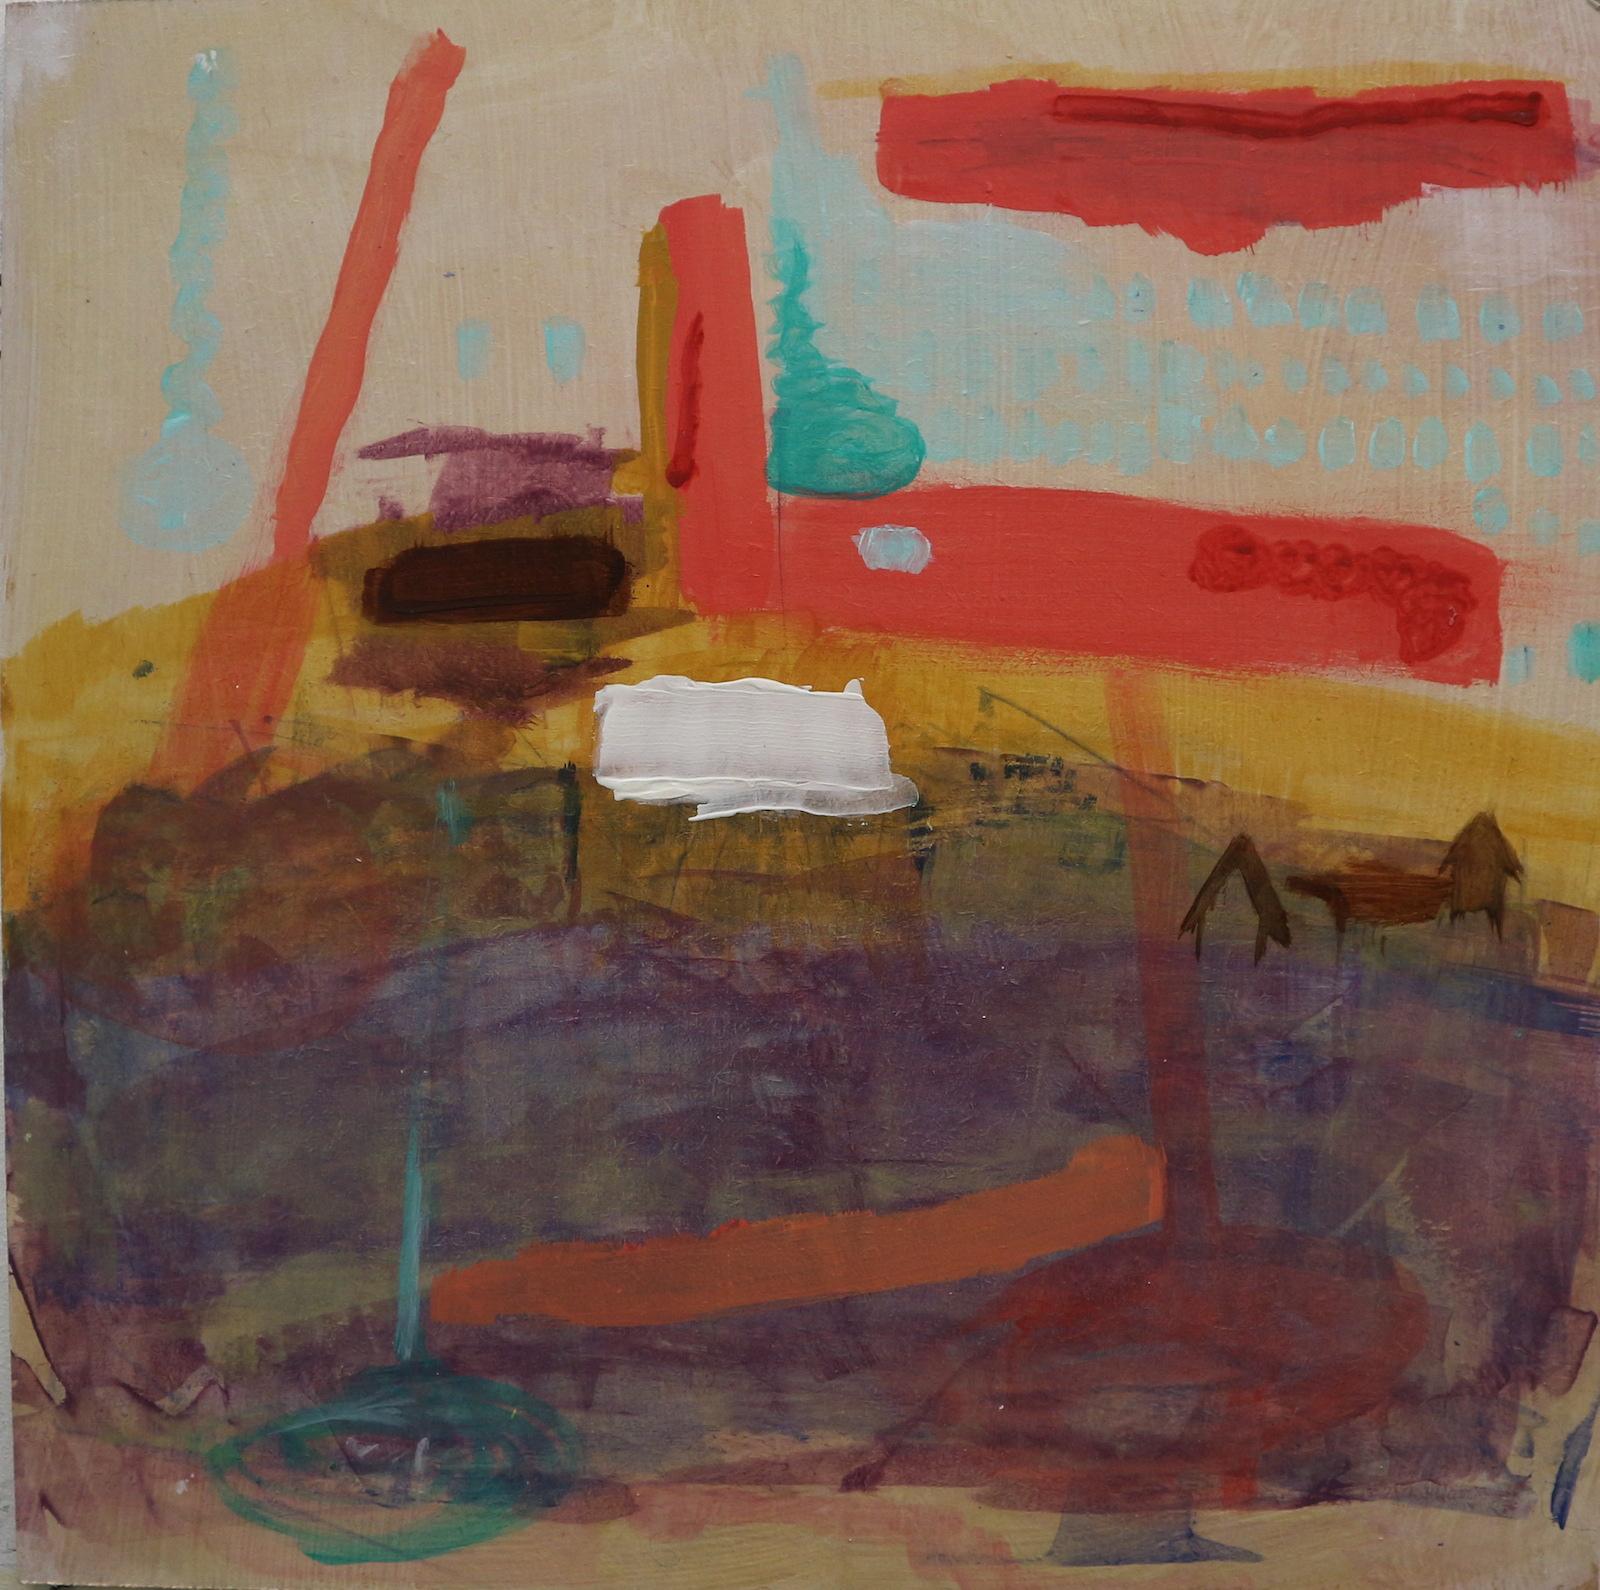 blobs in the distance, 40 cm x 40 cm, acrylic on mdf, 2016, Jane Hughes